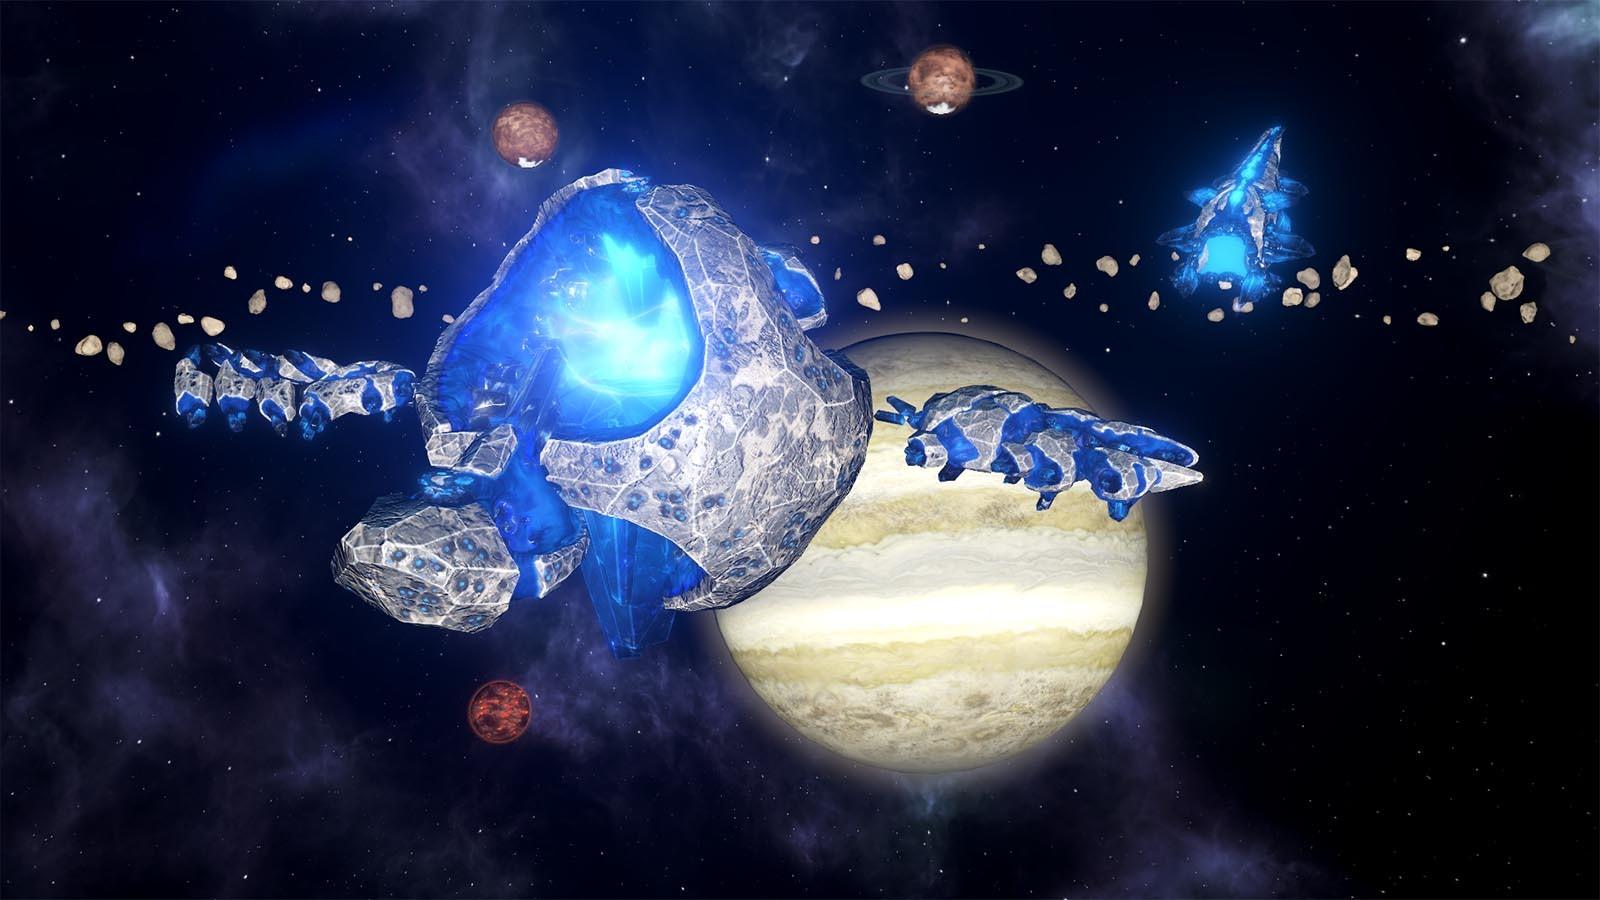 Stellaris: Lithoids Species Pack | ROW (bd849c28-b4cf-4d6a-b52a-520772b3a2be)